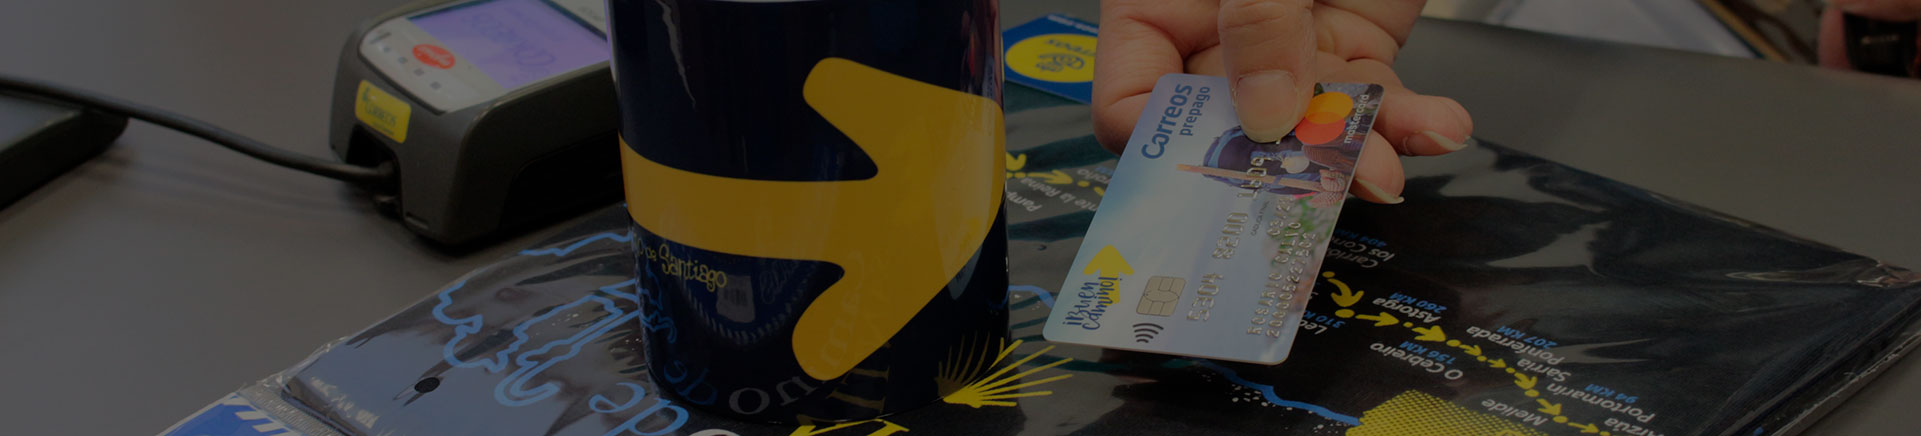 Prepaid-Karte